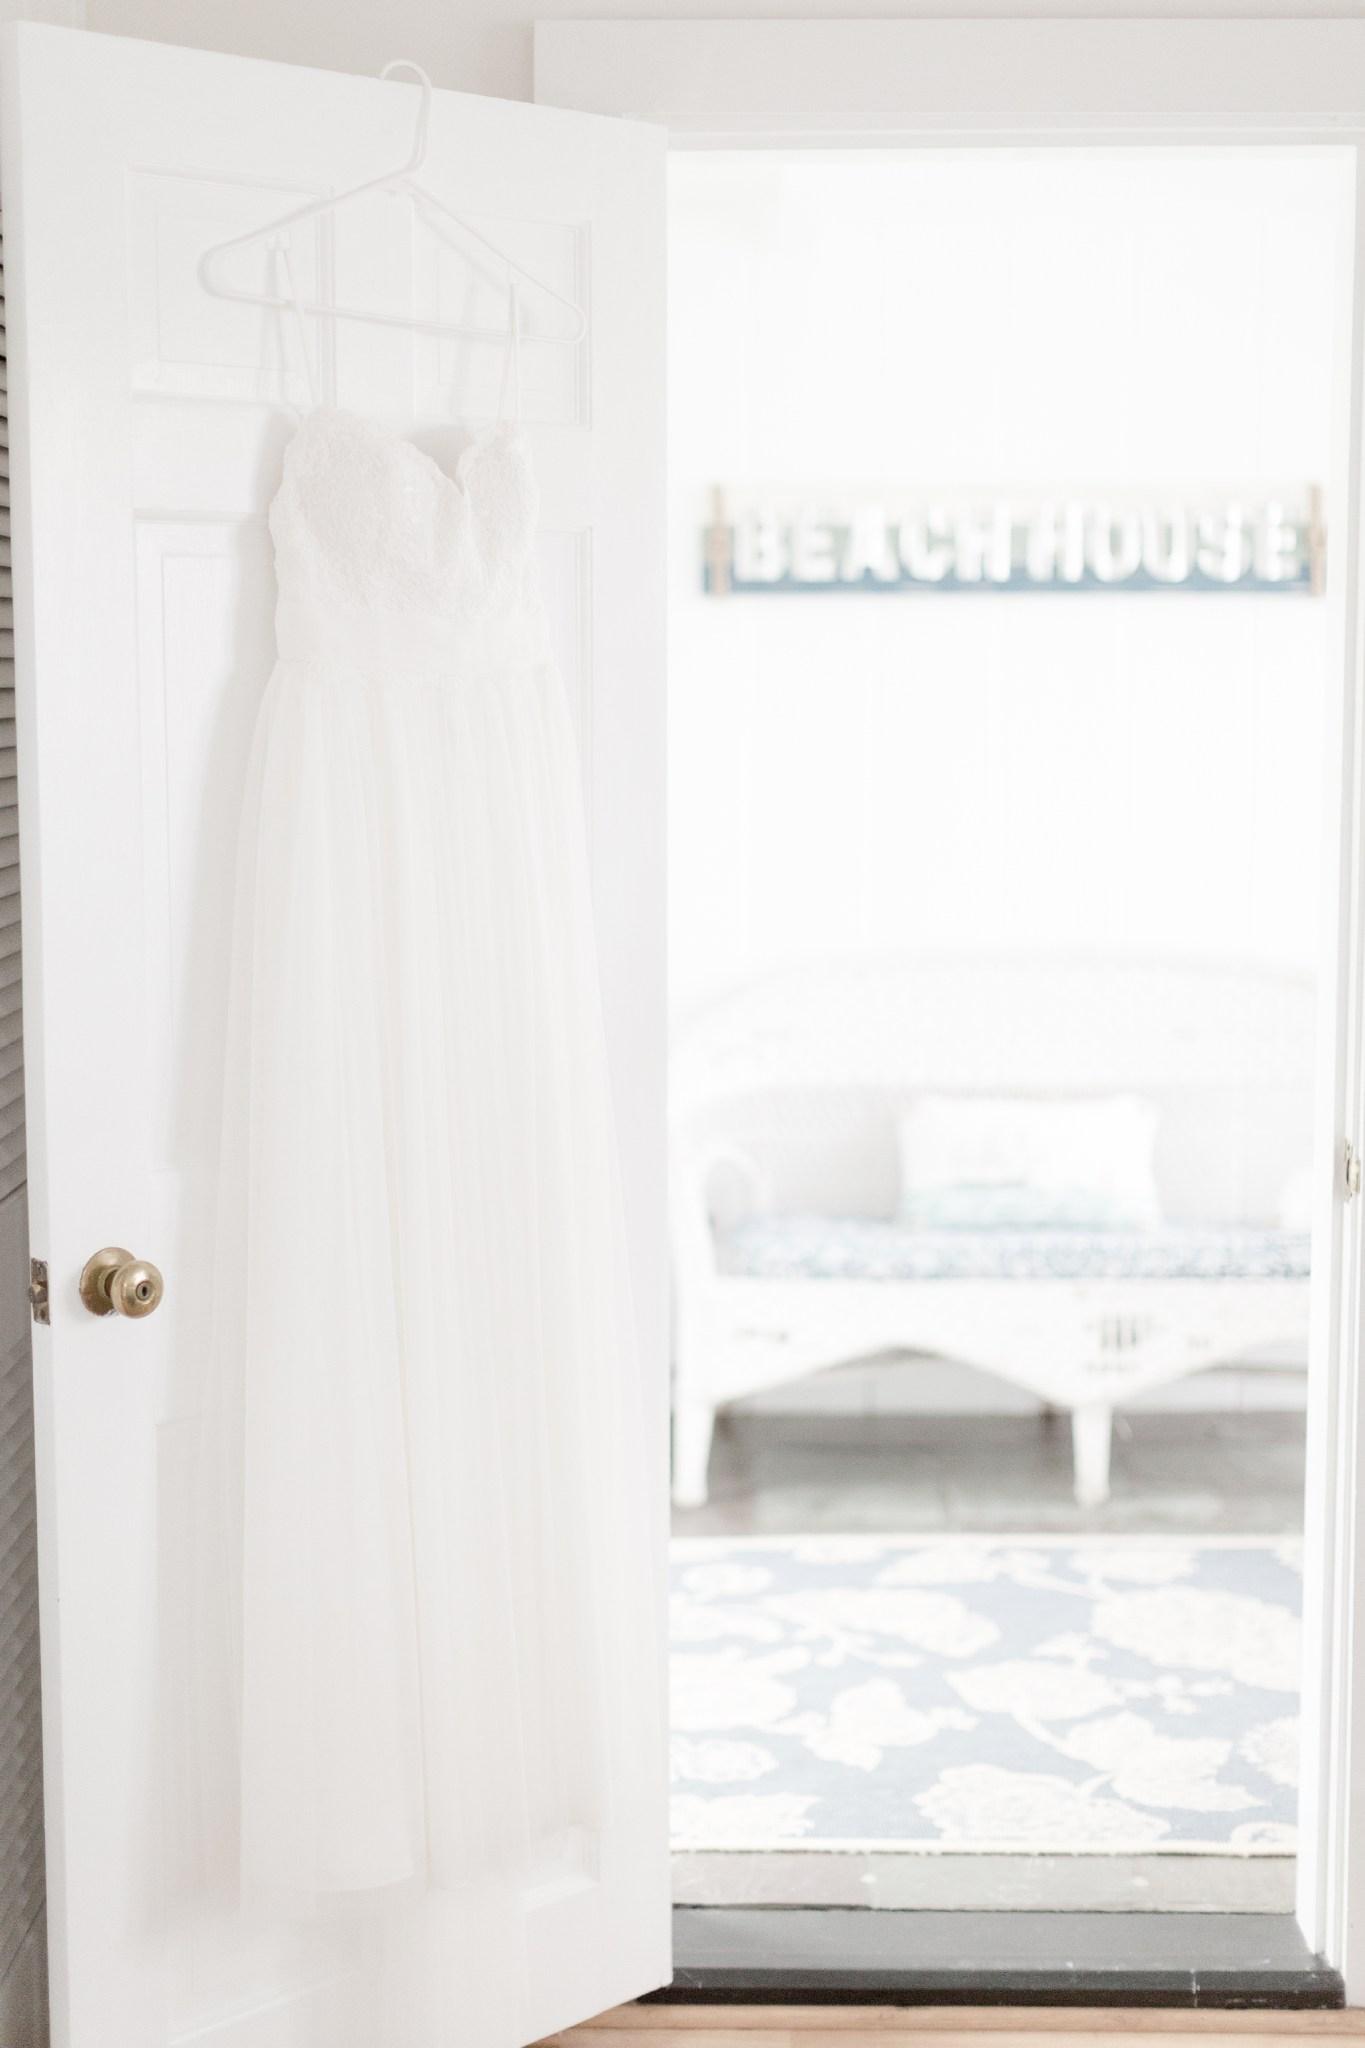 cape_cod_wedding_deborah_zoe_Photography_00012.JPG